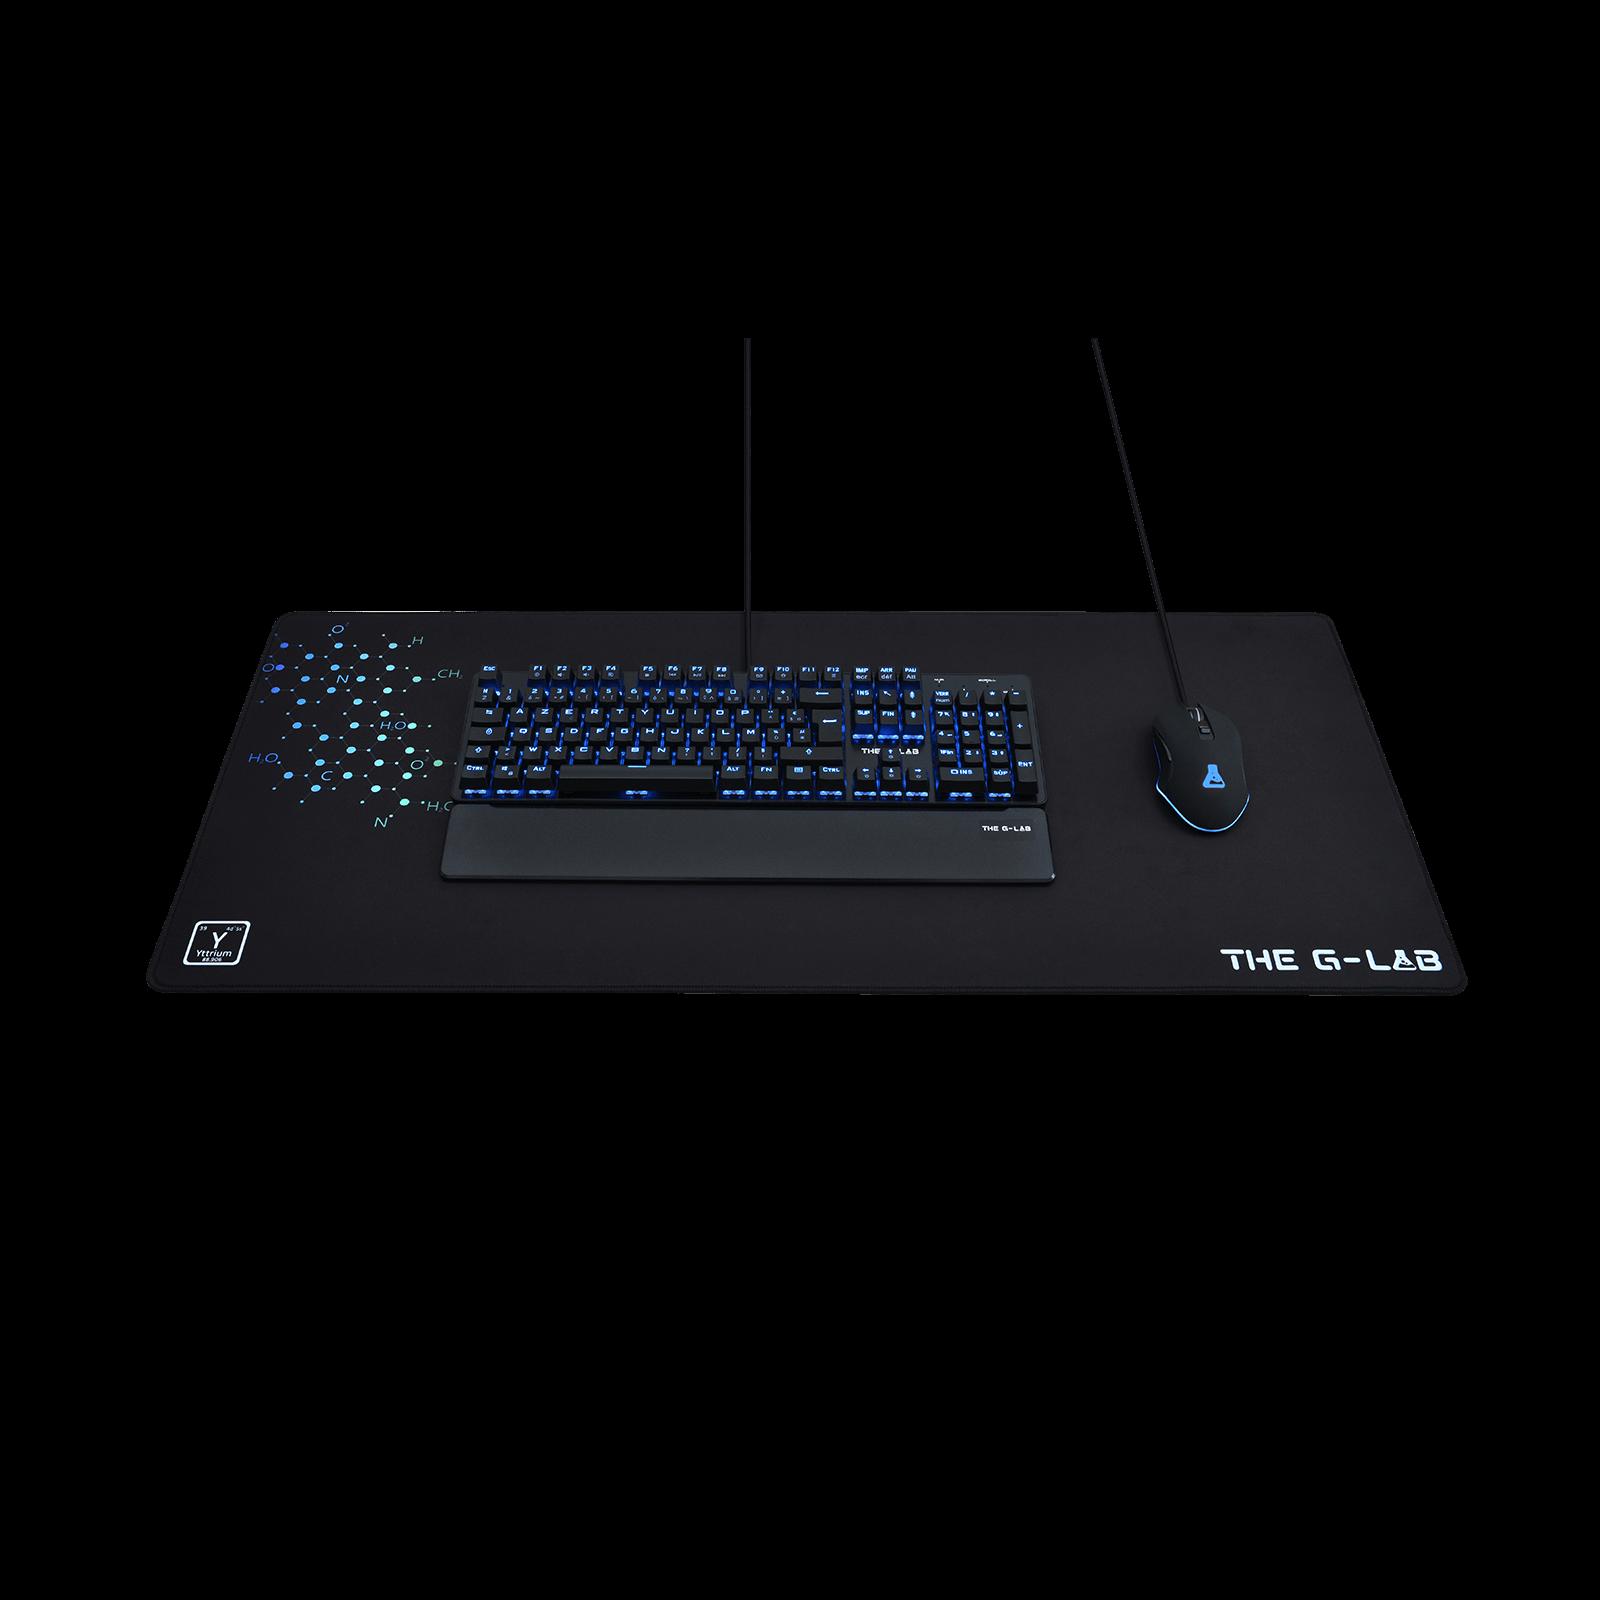 The G-LAB - Gaming Mouse Pad XXL 900x400mm - Tapis de souris - 2